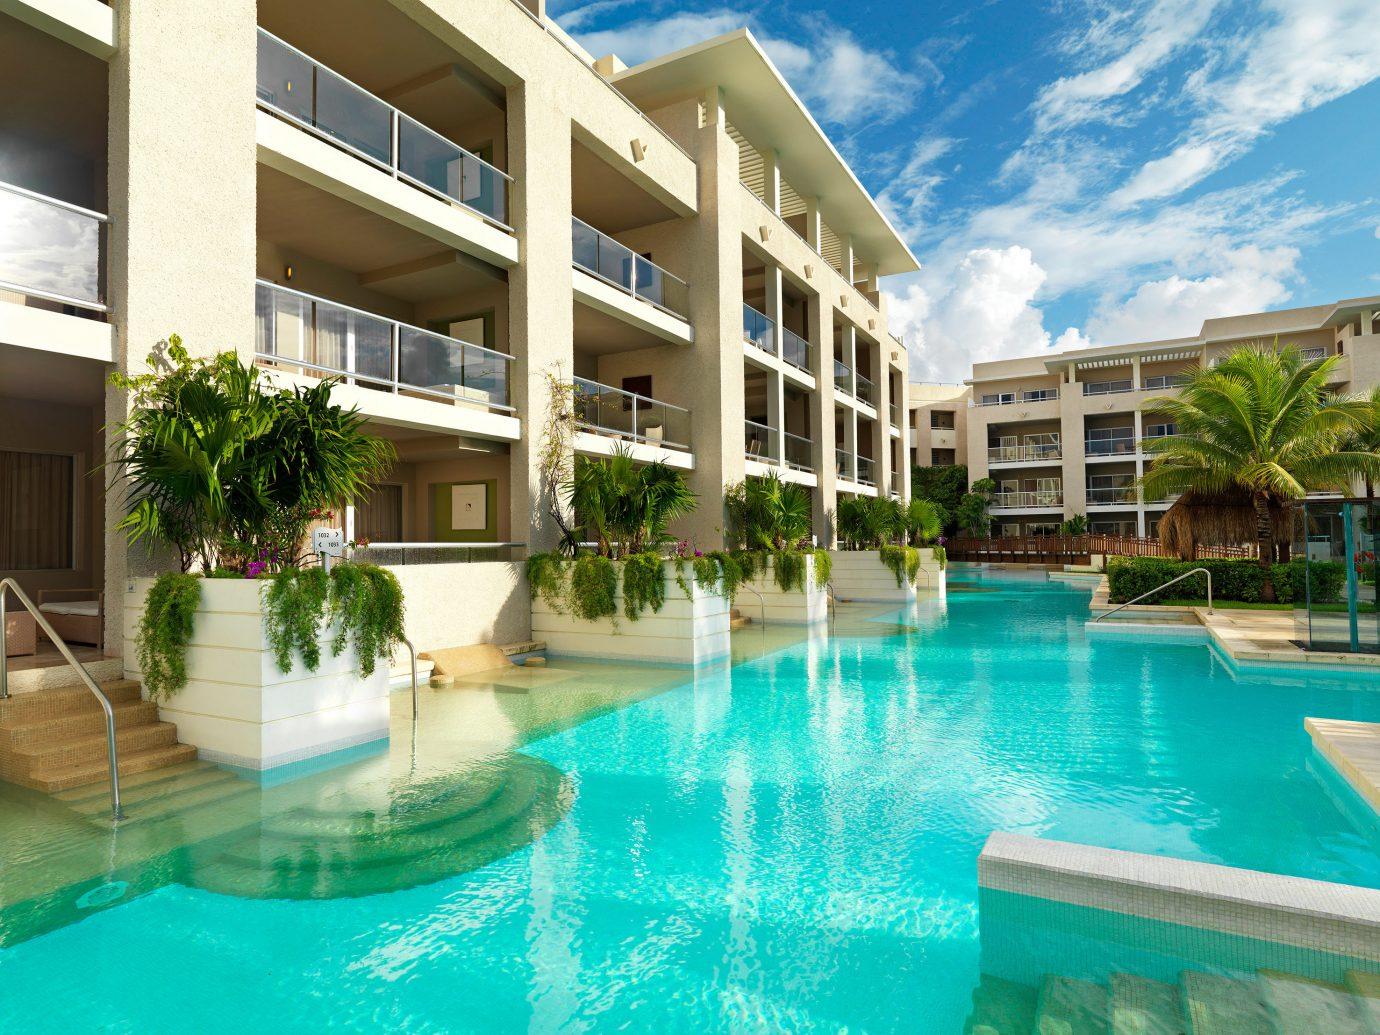 Hotels building condominium swimming pool Resort property leisure Pool estate leisure centre real estate home blue resort town Villa apartment mansion swimming